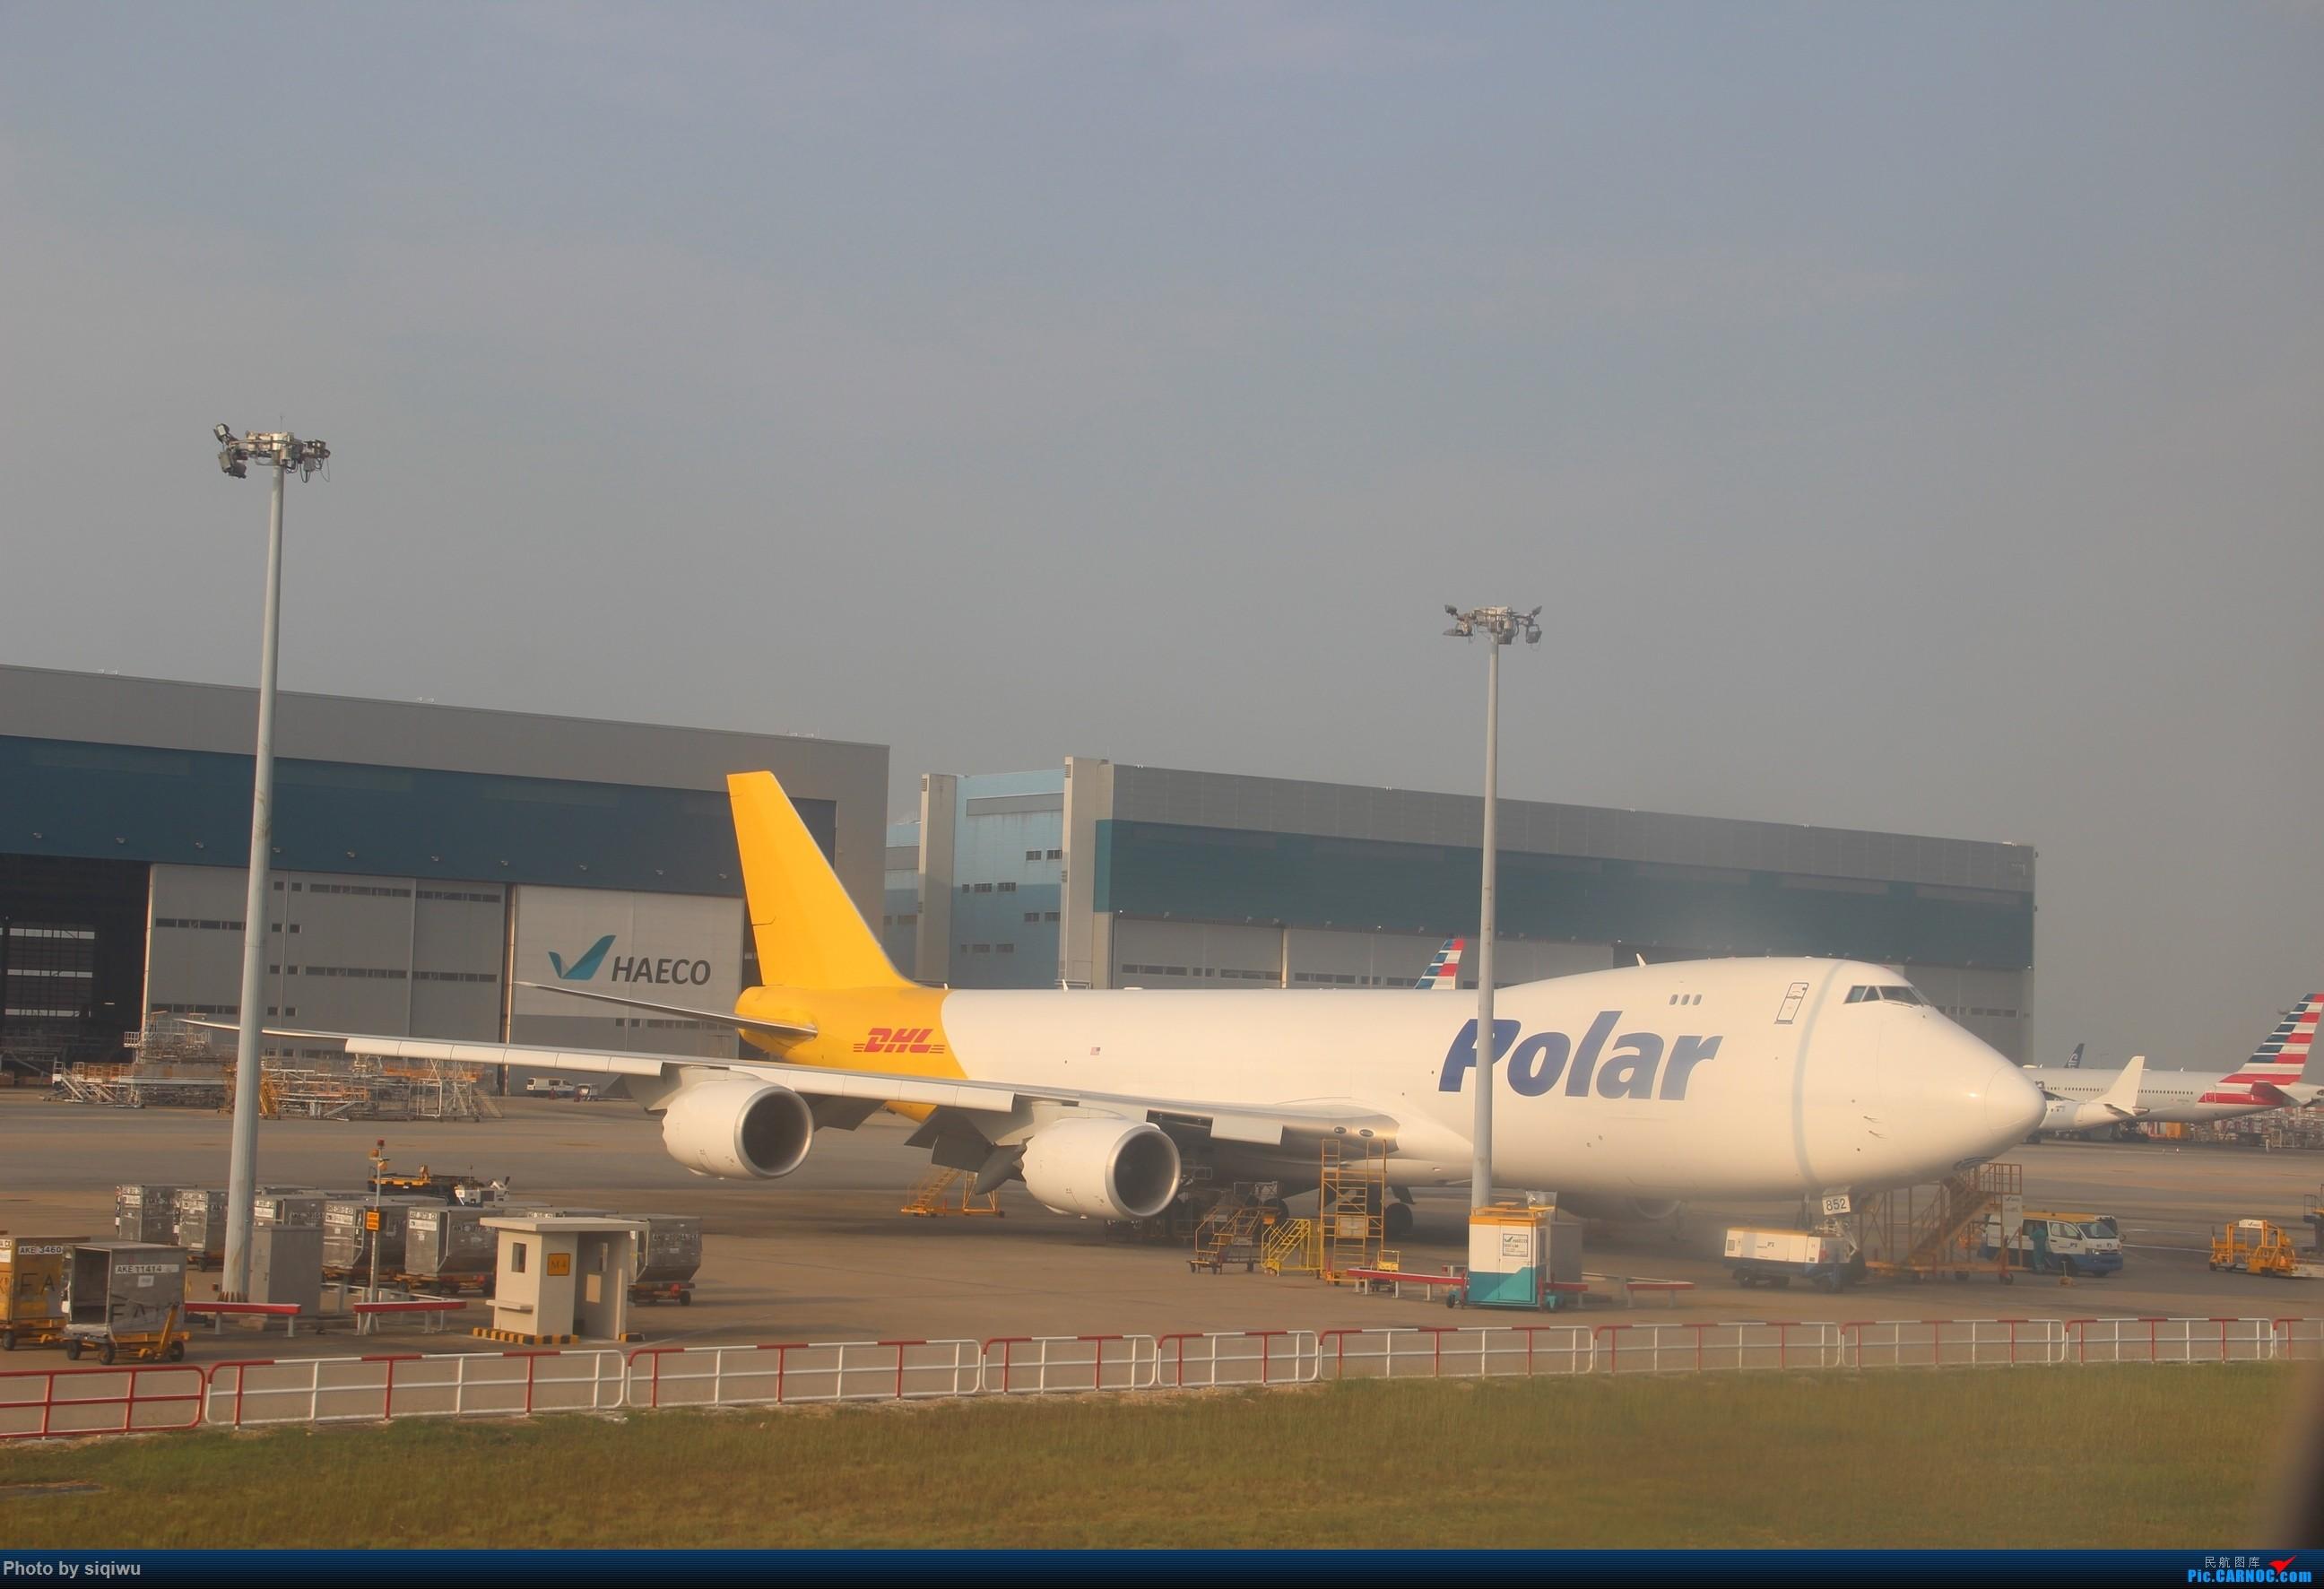 Re:[原创]PVG-HKG-KUL-HKG-PVG 四天往返,CX/KA BOEING 747-8I  中国香港国际机场